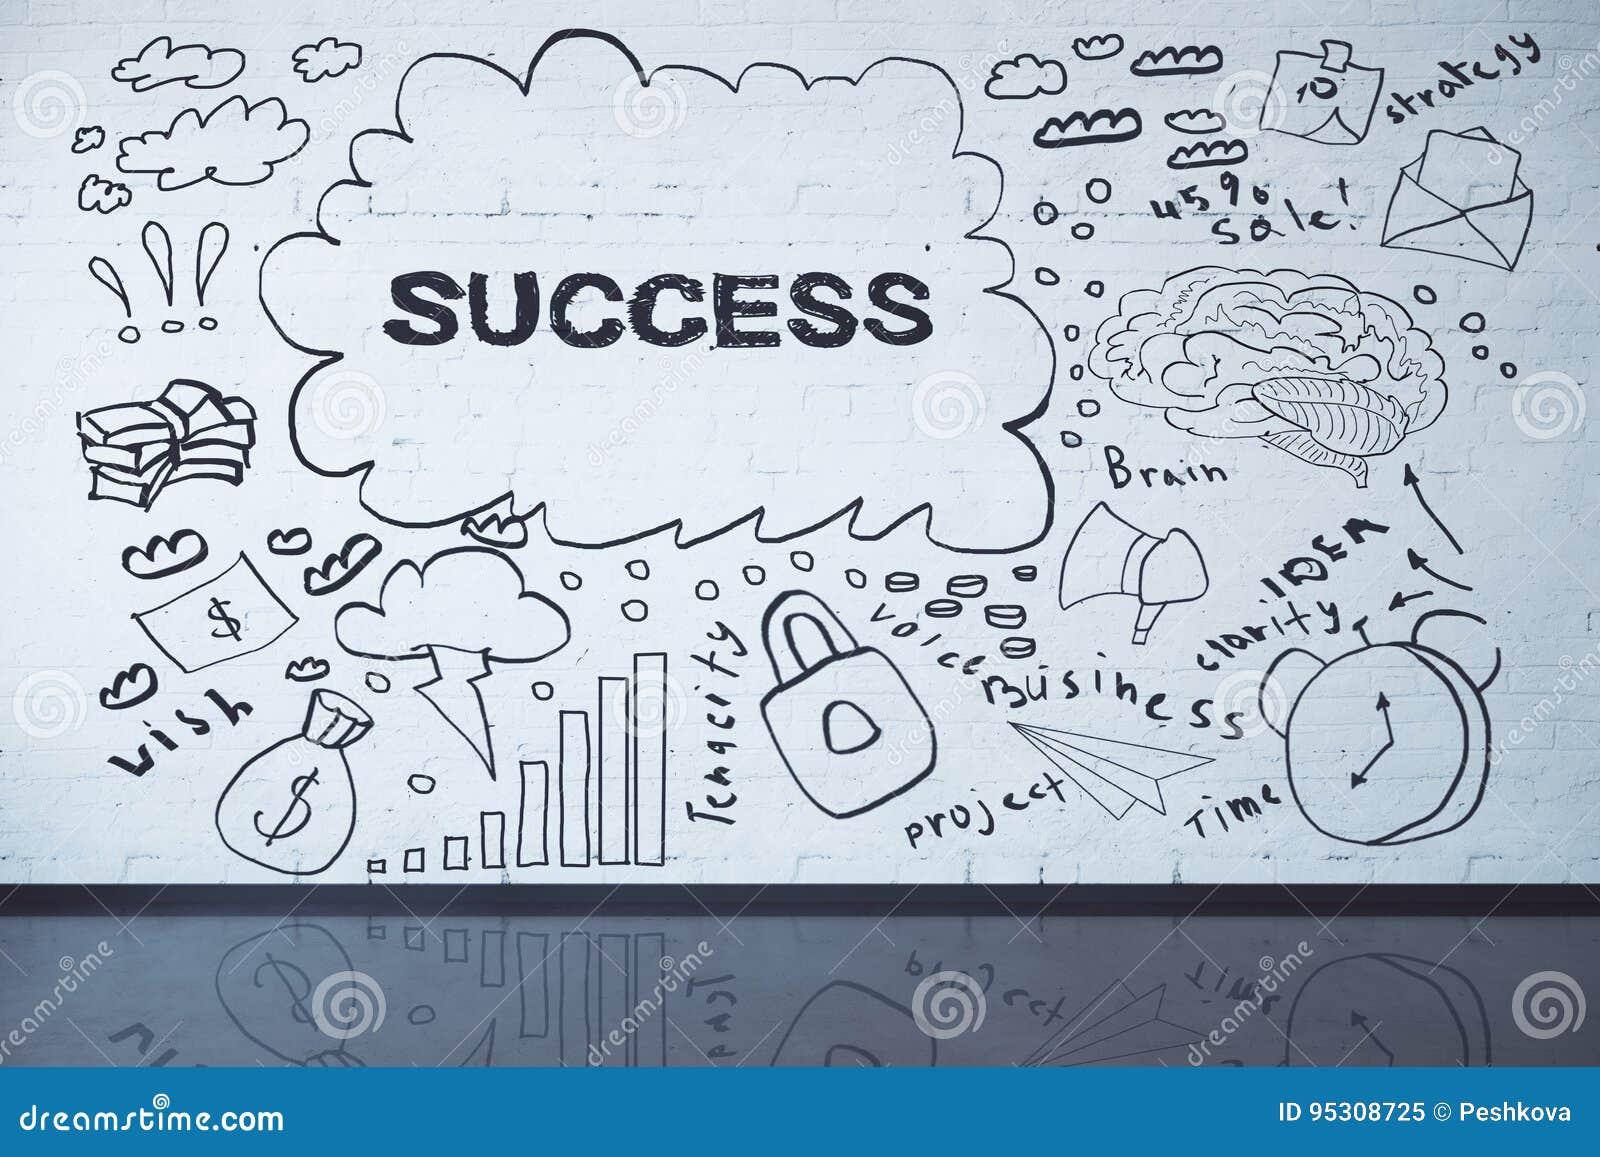 Business concept images more my portfolio startegy